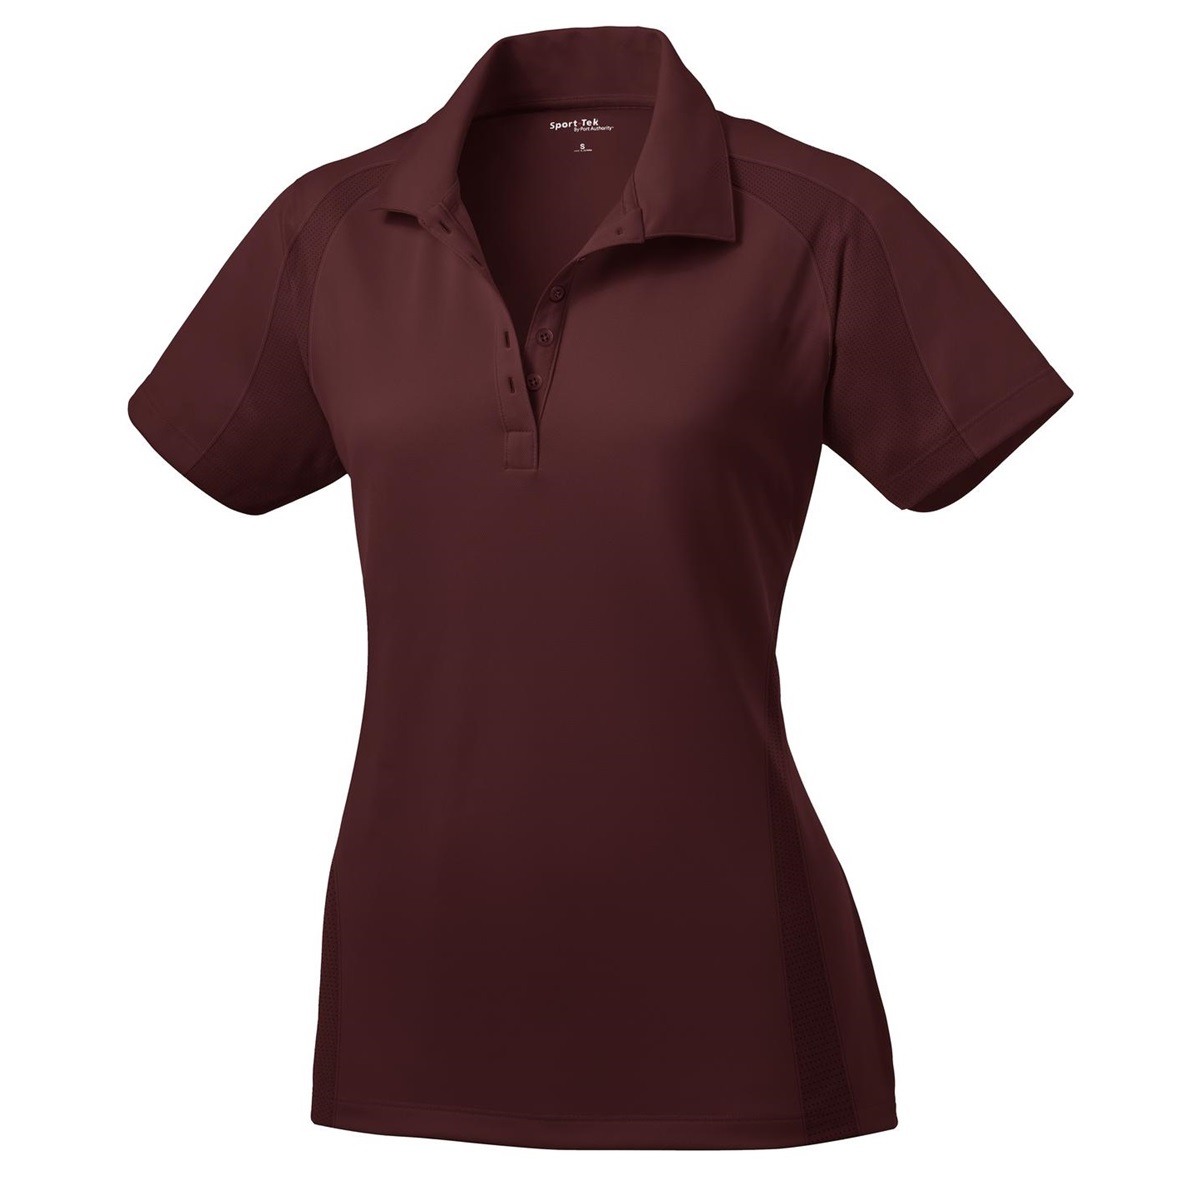 Sport tek l474 ladies dri mesh pro polo shirt maroon for Maroon dri fit polo shirt